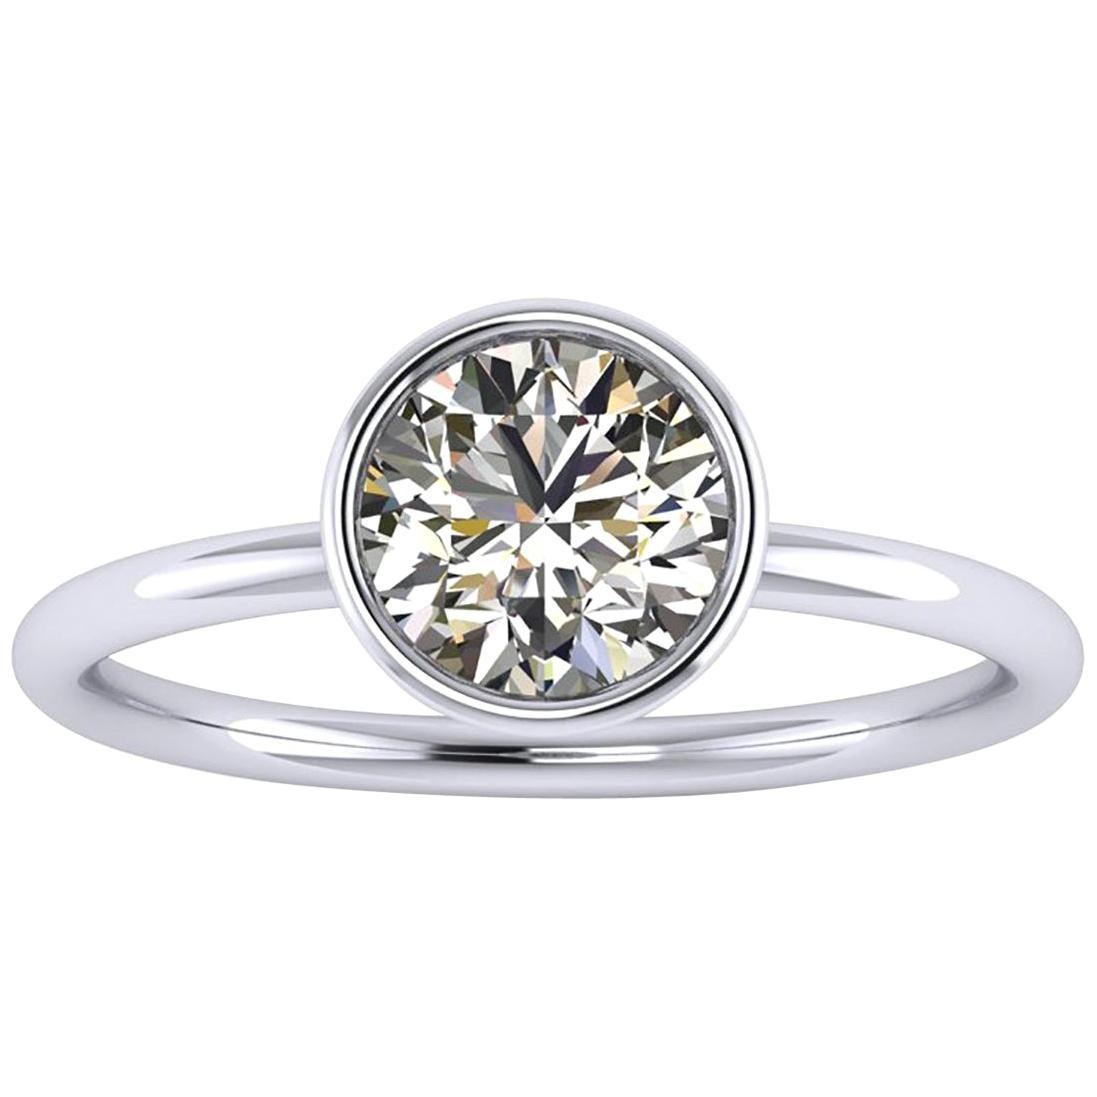 GIA Certified 1.01 Carat White Diamond in Platinum 950 Handmade Ring